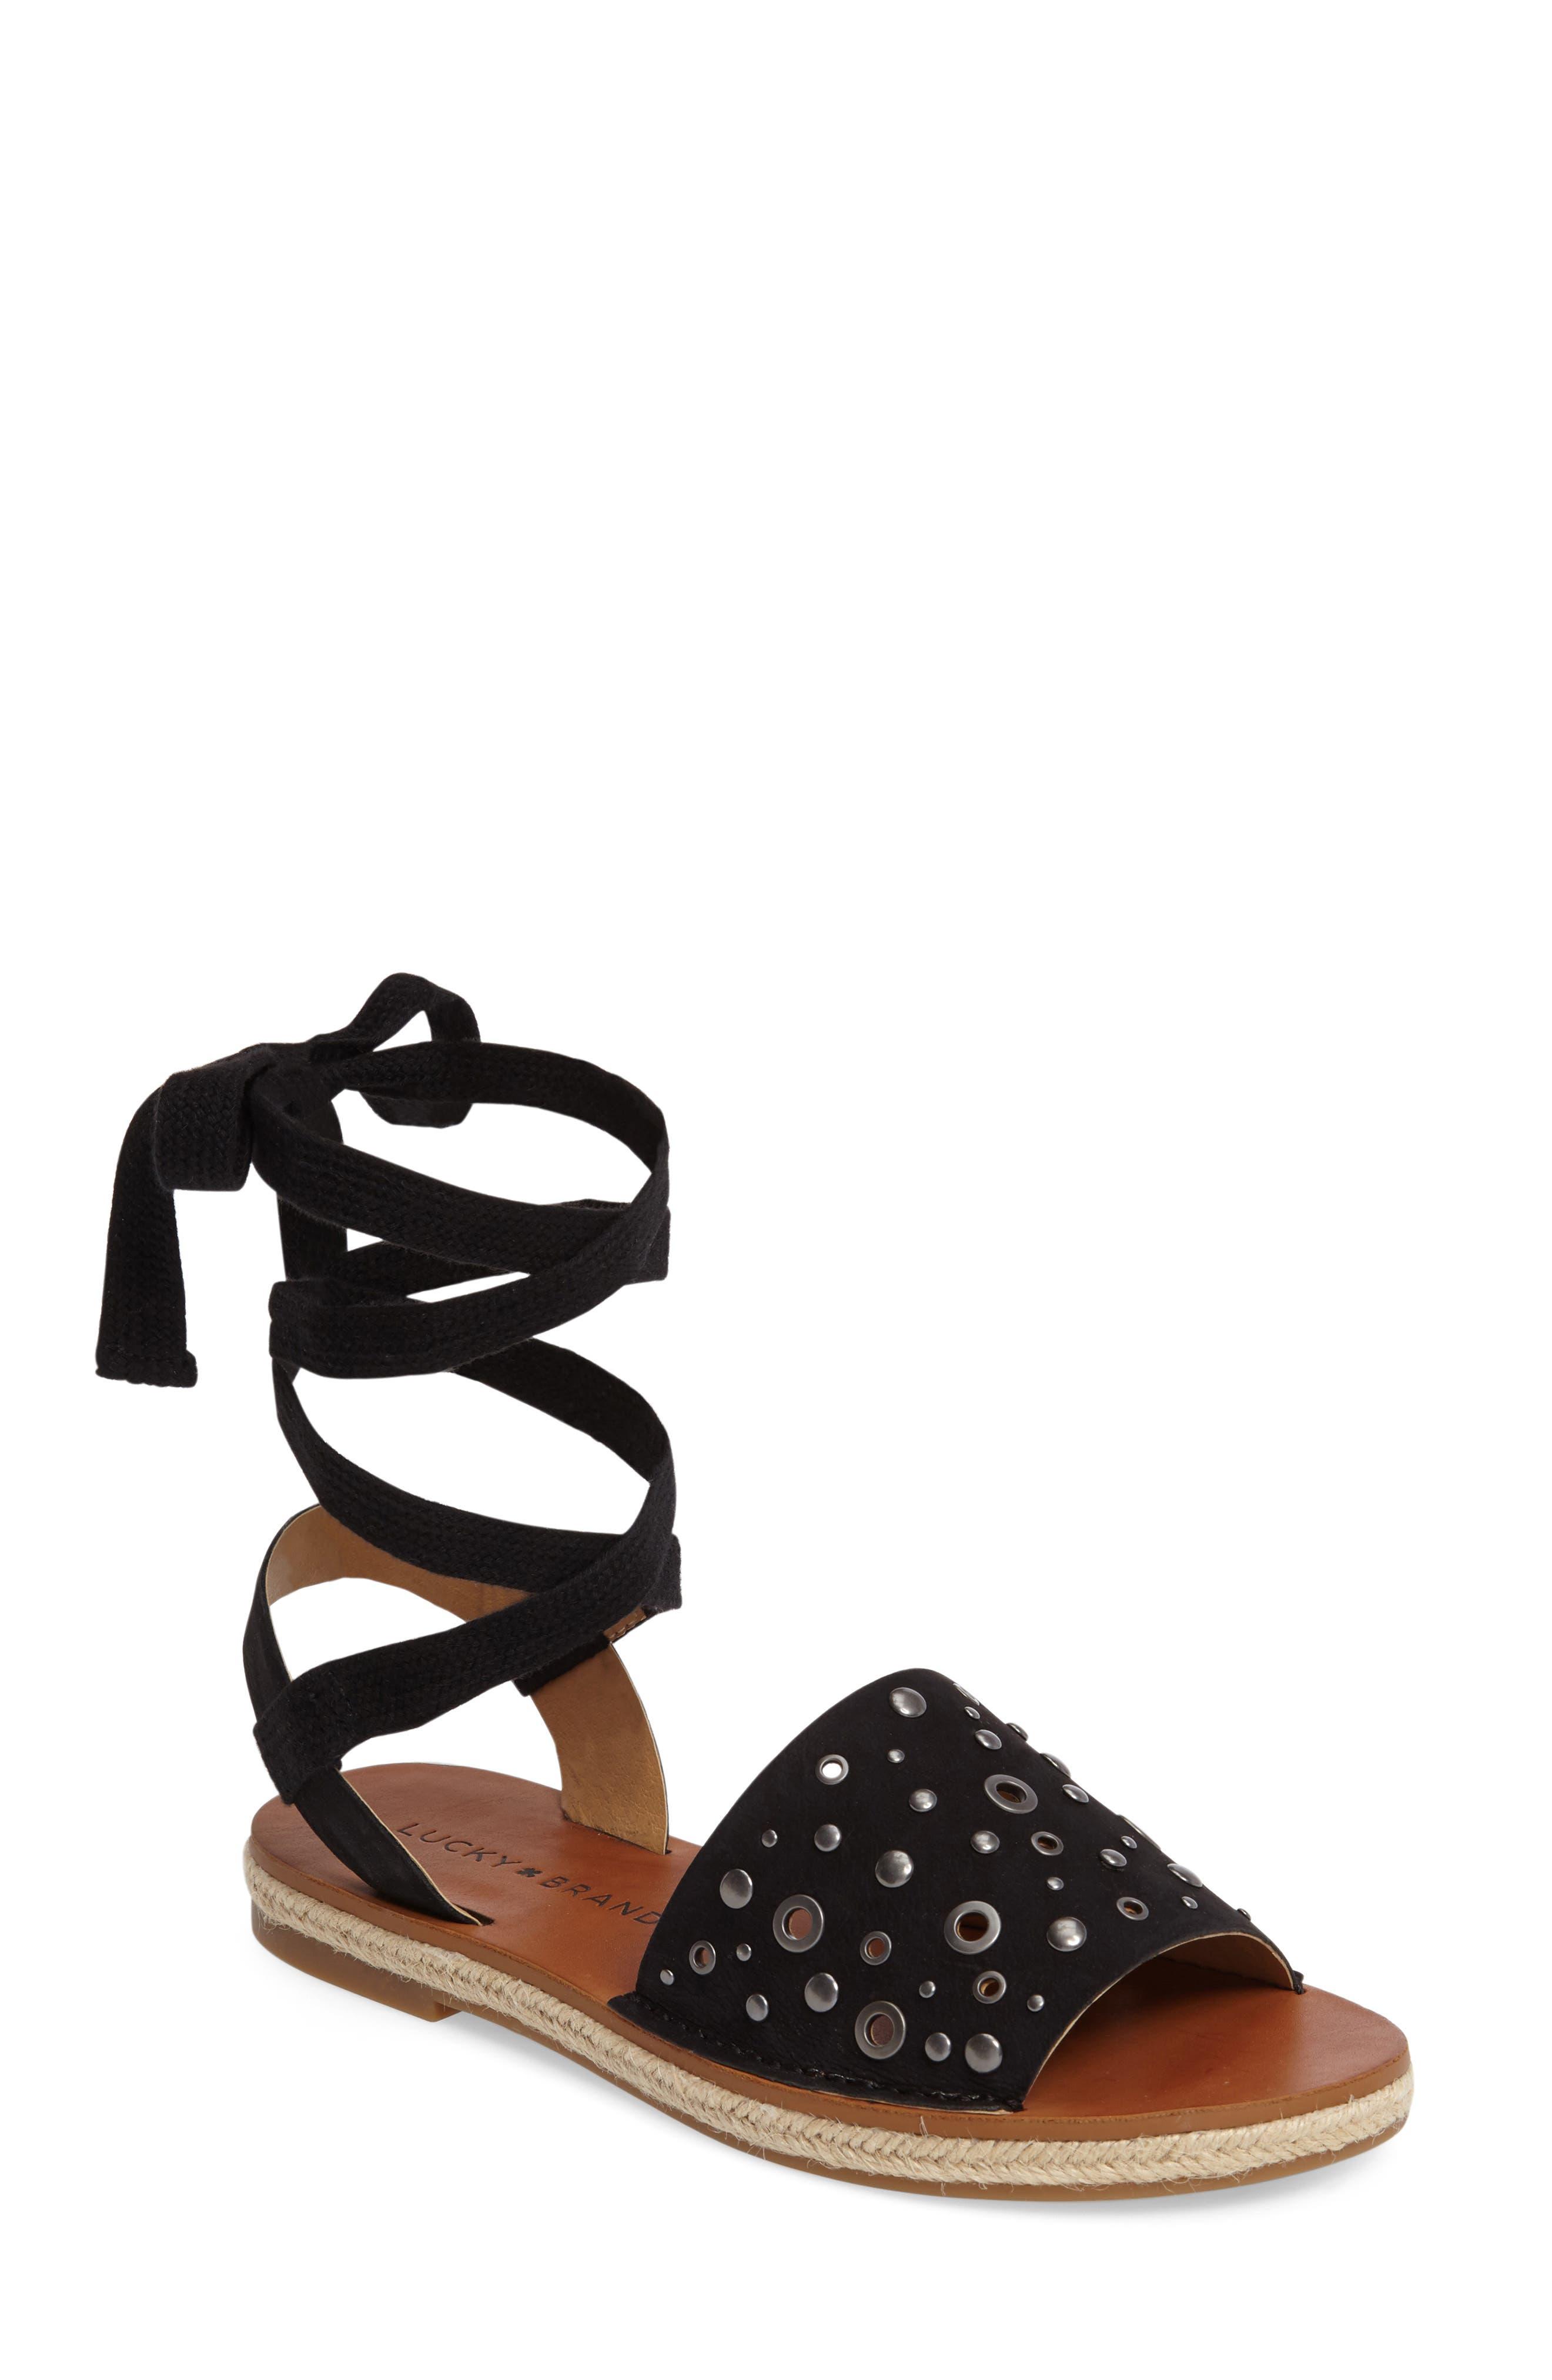 Daytah Ankle Tie Sandal,                             Main thumbnail 1, color,